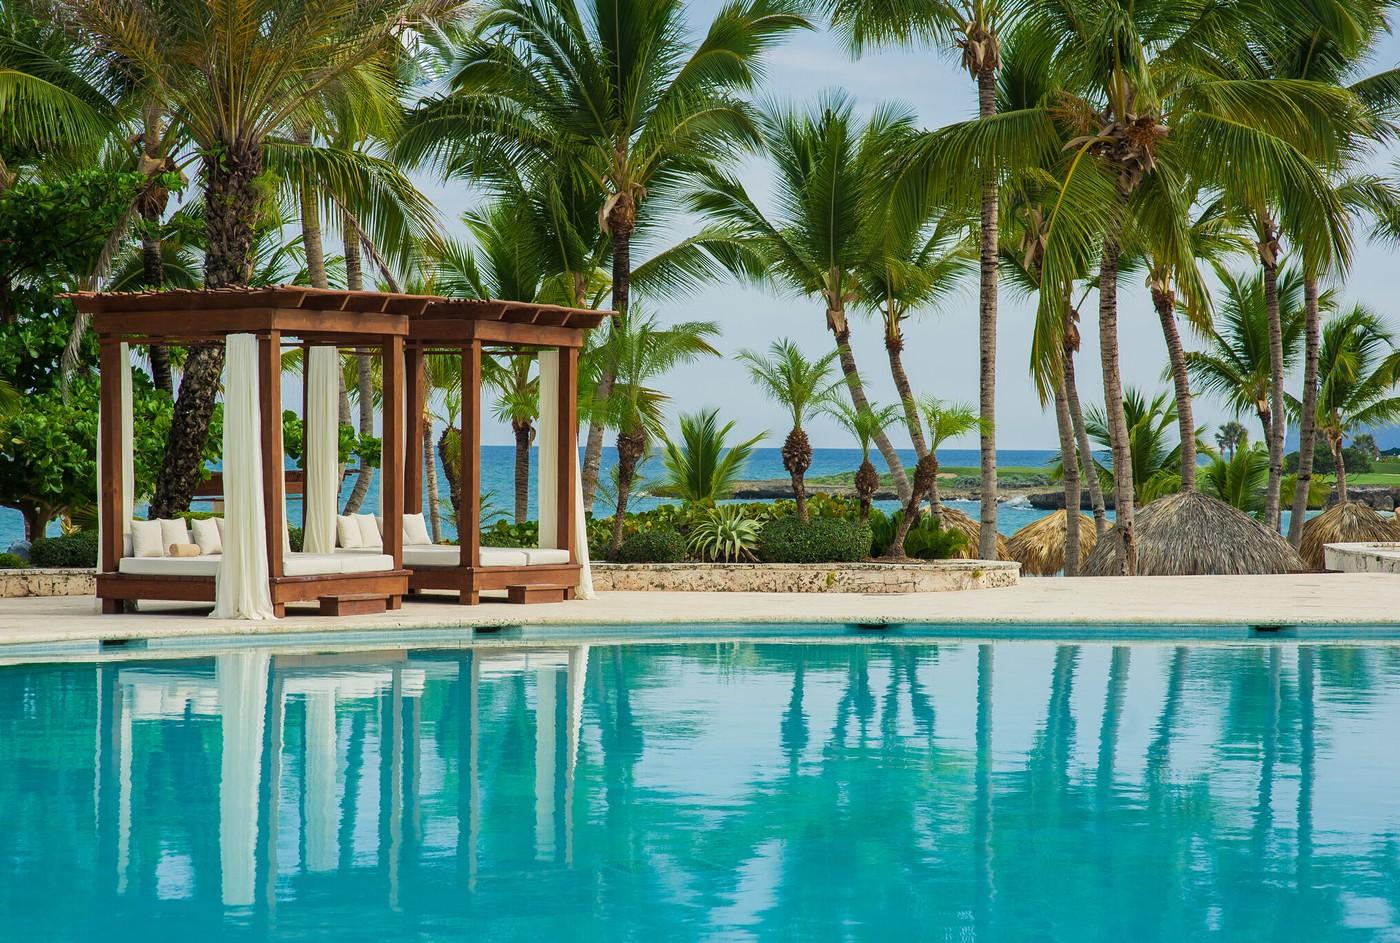 Swimming Pool At Tropical Beach